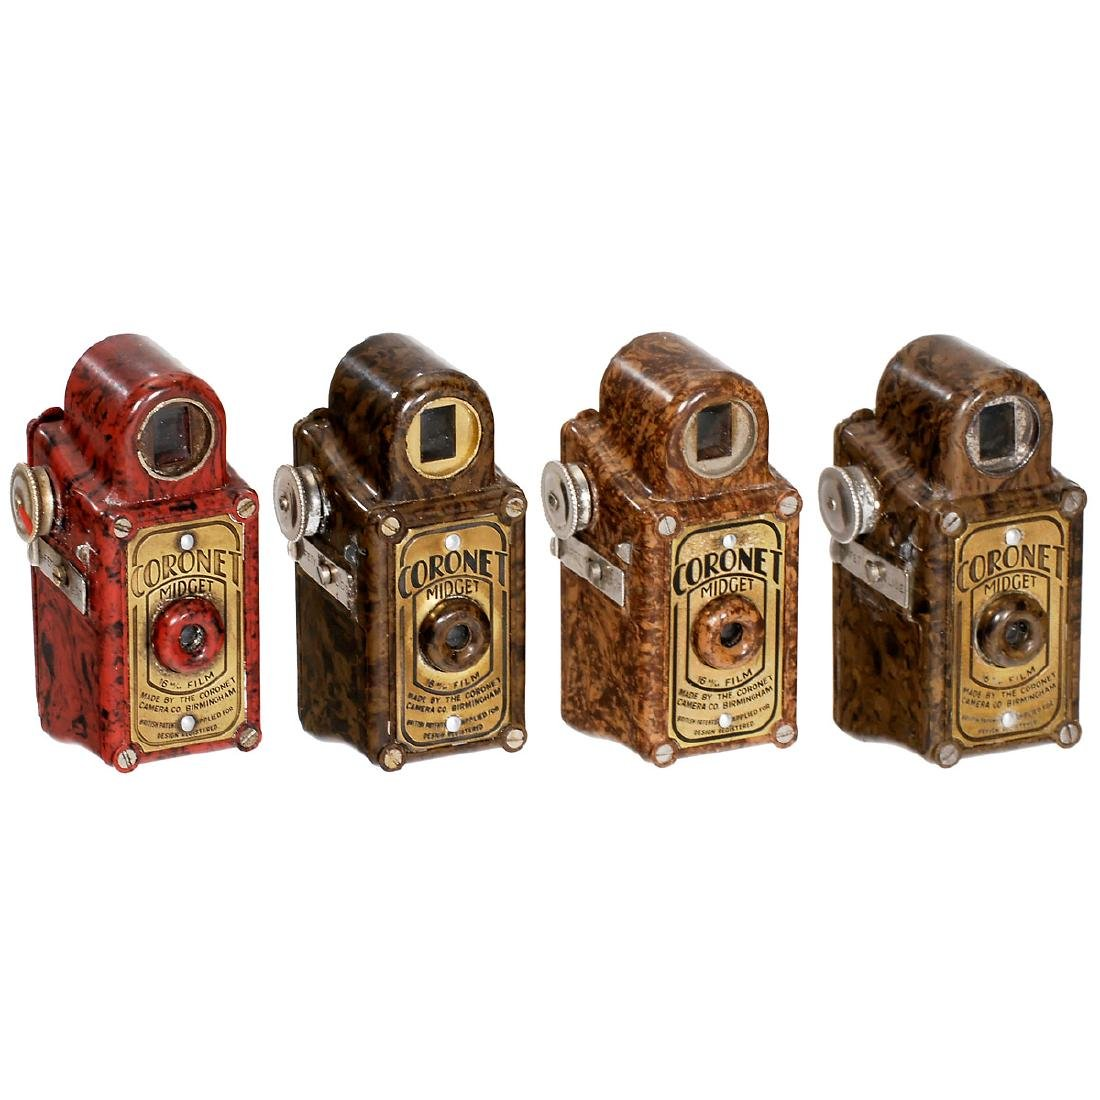 4 Colored Coronet Midget Cameras, c. 1935